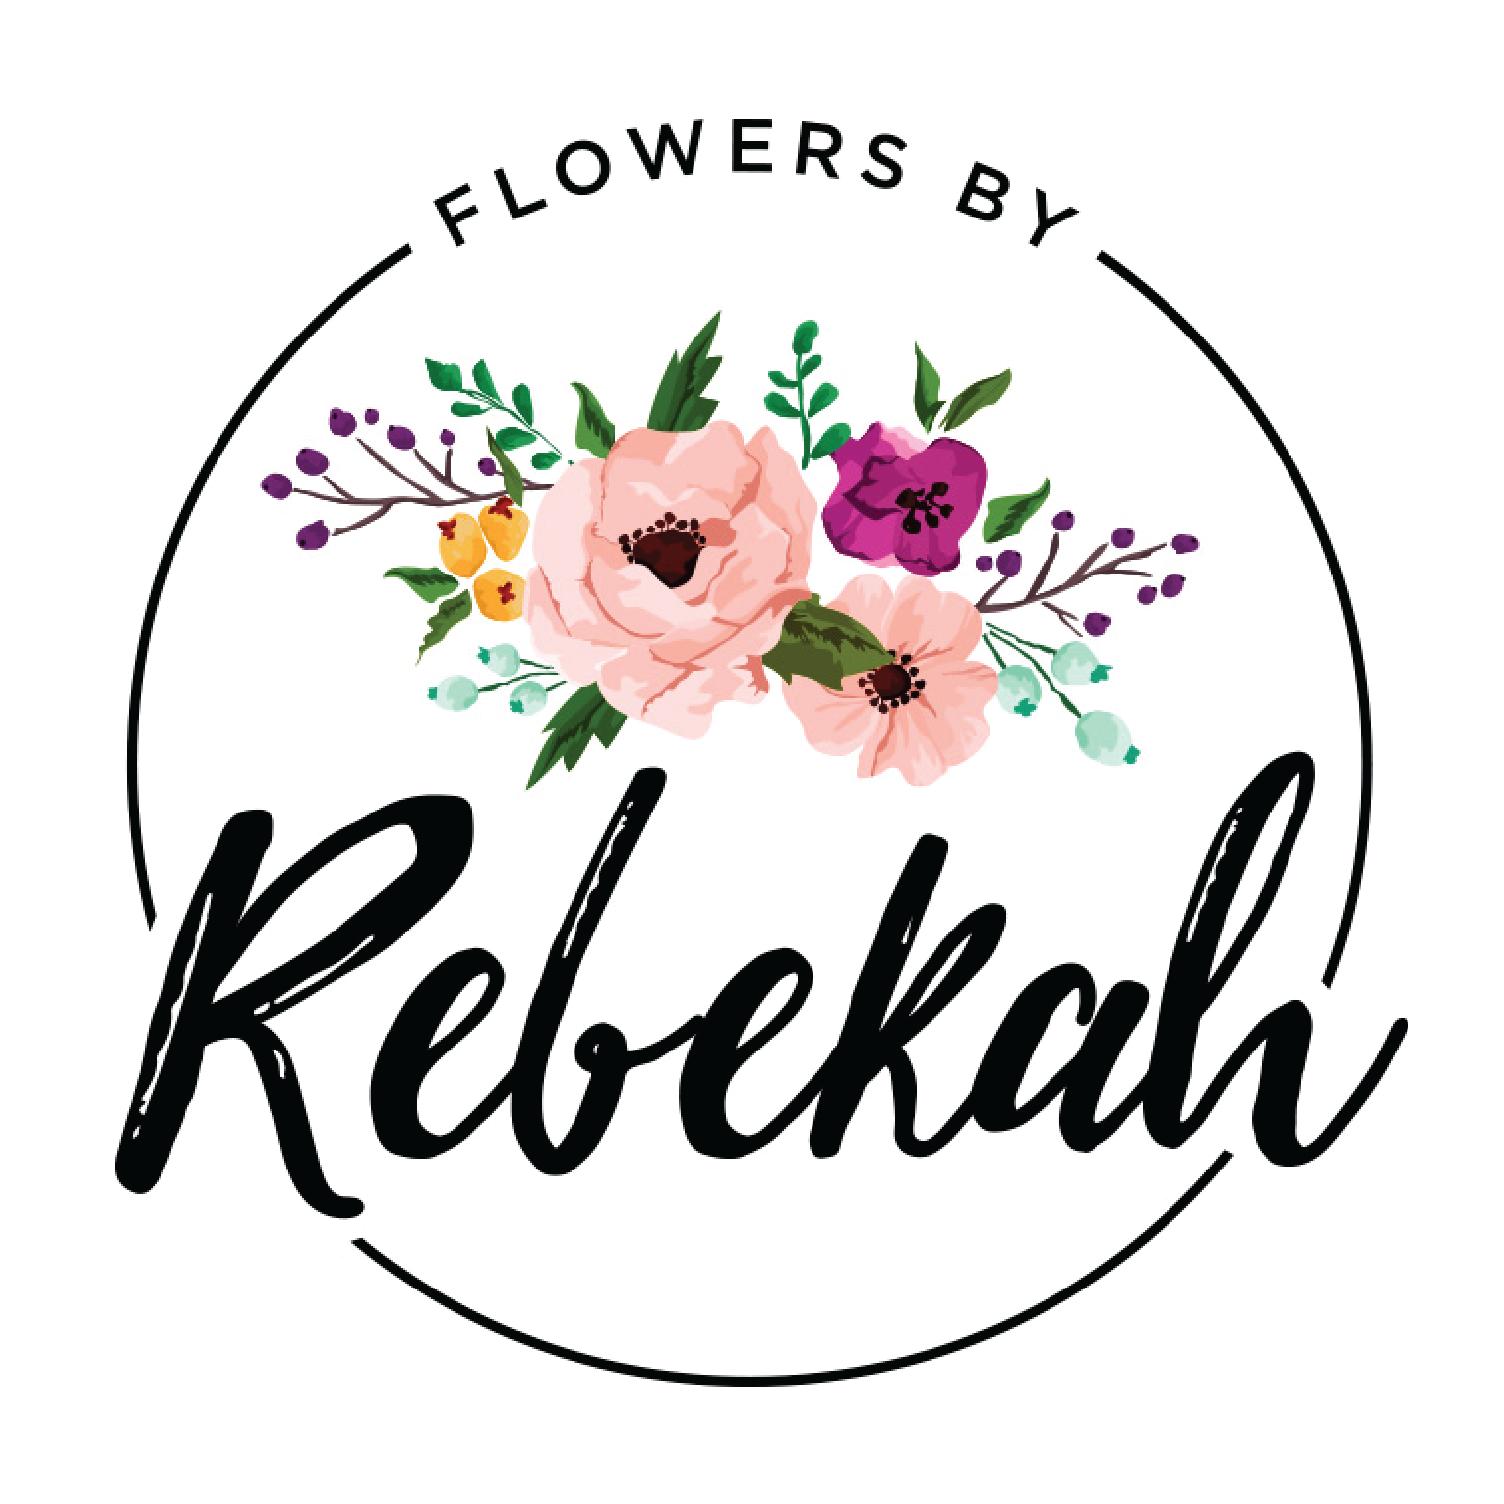 Rebekah-01.png